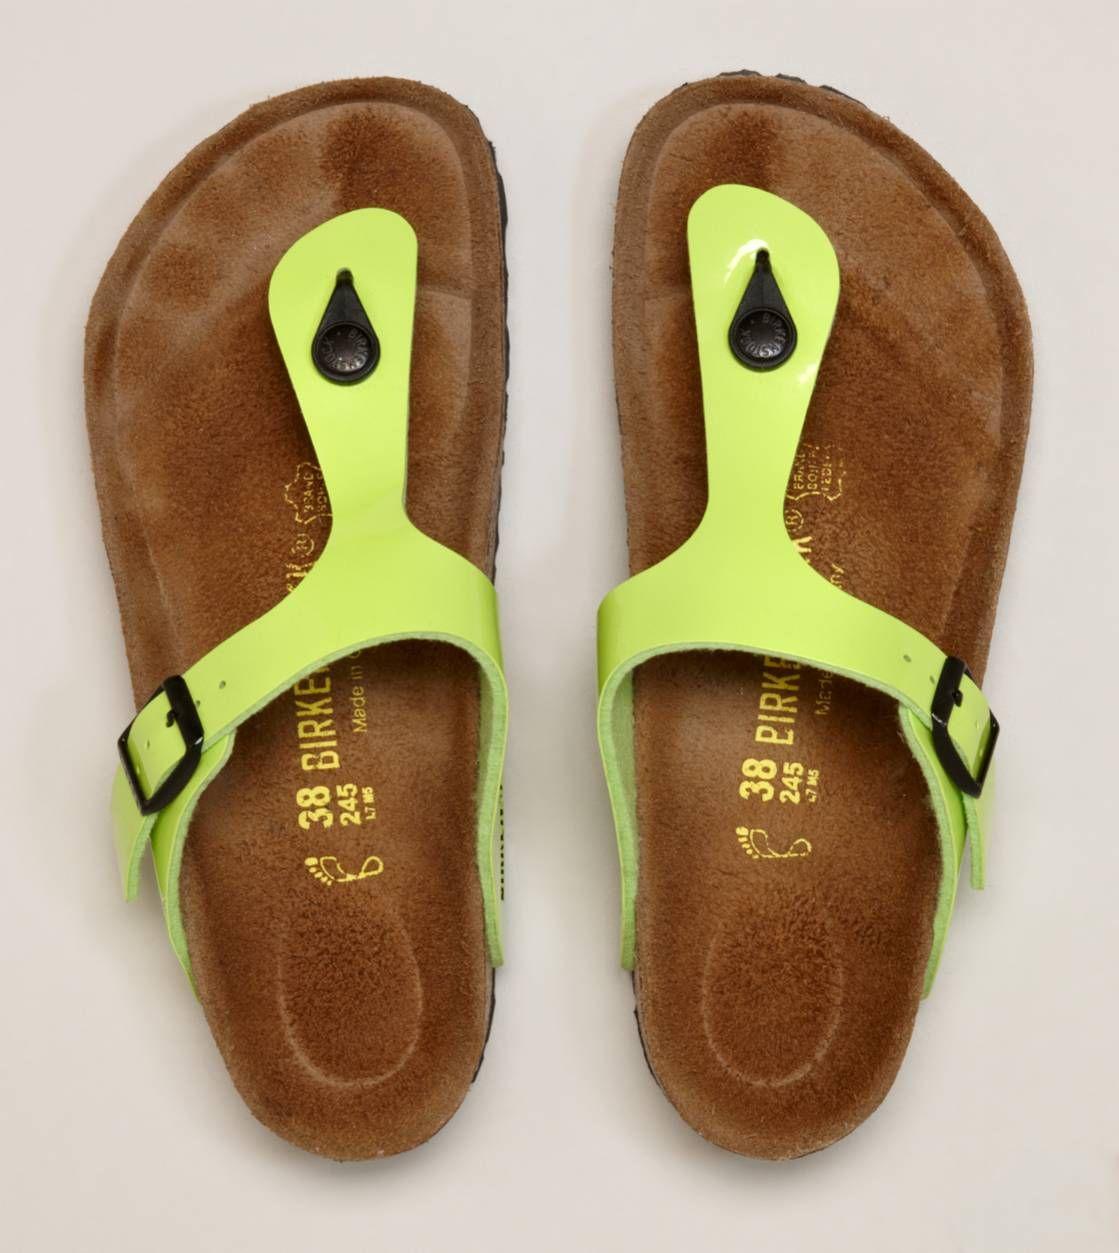 Shoes sandals flip flops - Aeo Flat Sandal